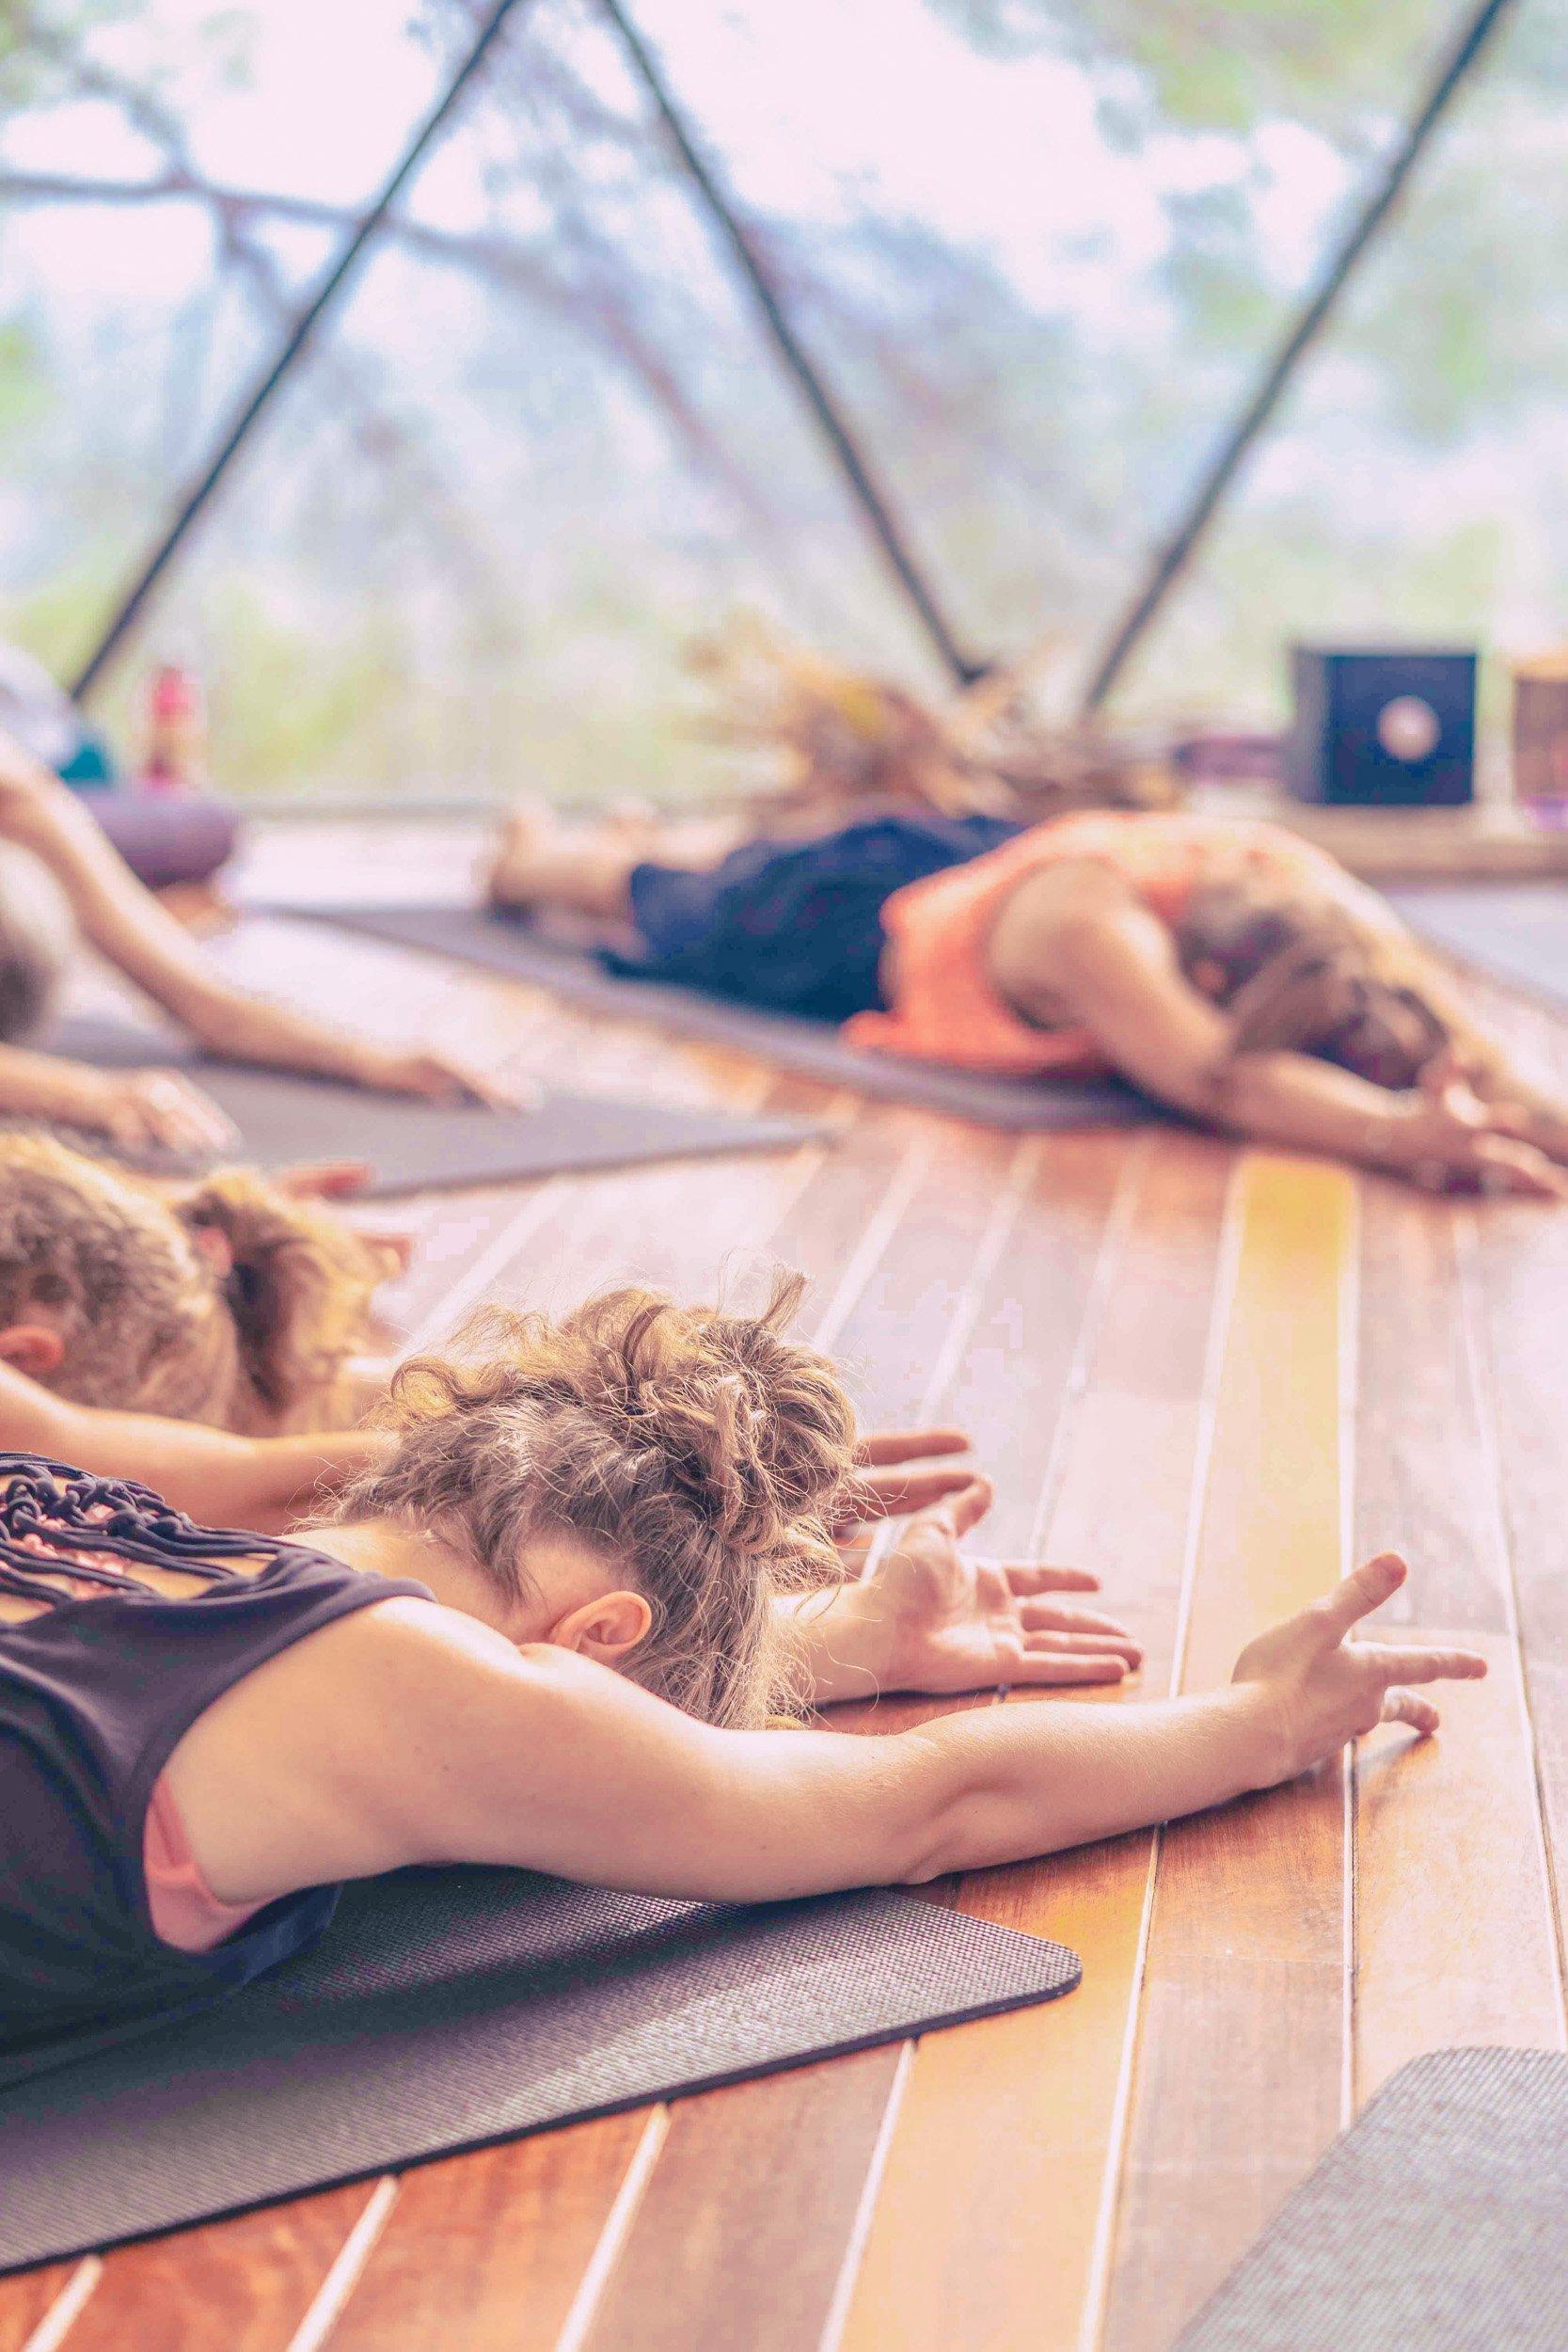 jodie-louise-photoshoots-films-videos-retreats-wrkshops-spiritual-yoga-14